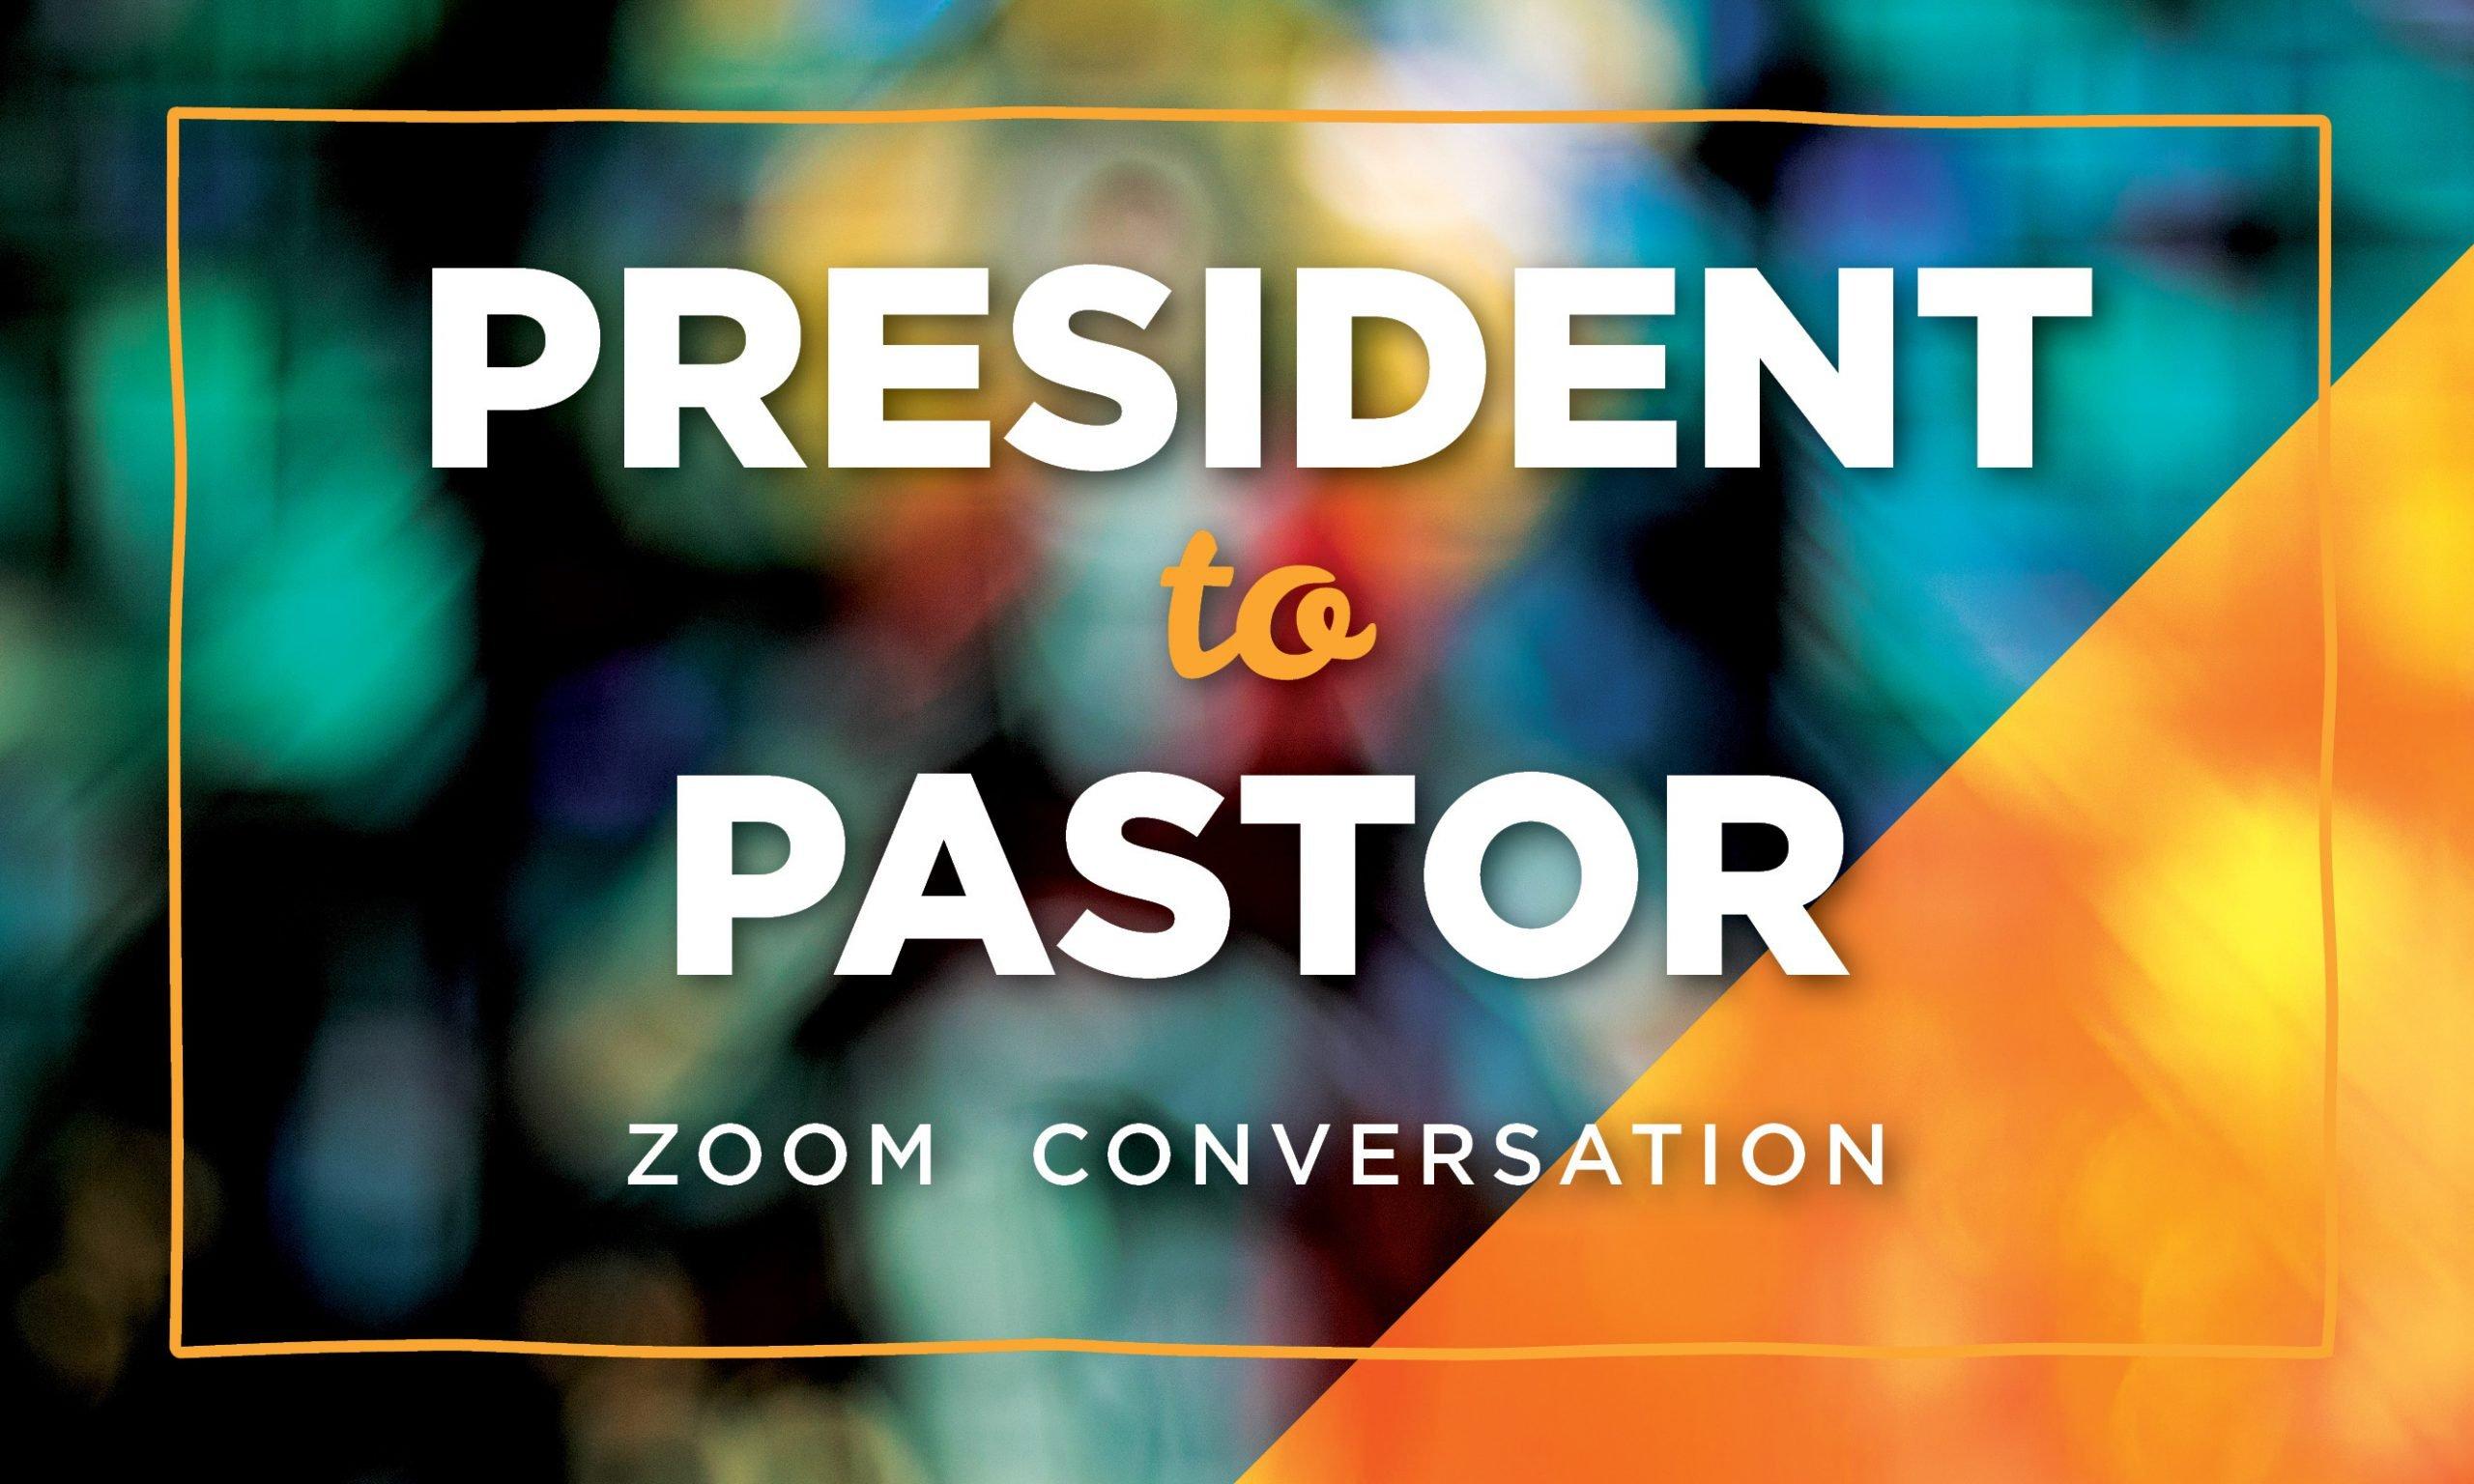 President to Pastor